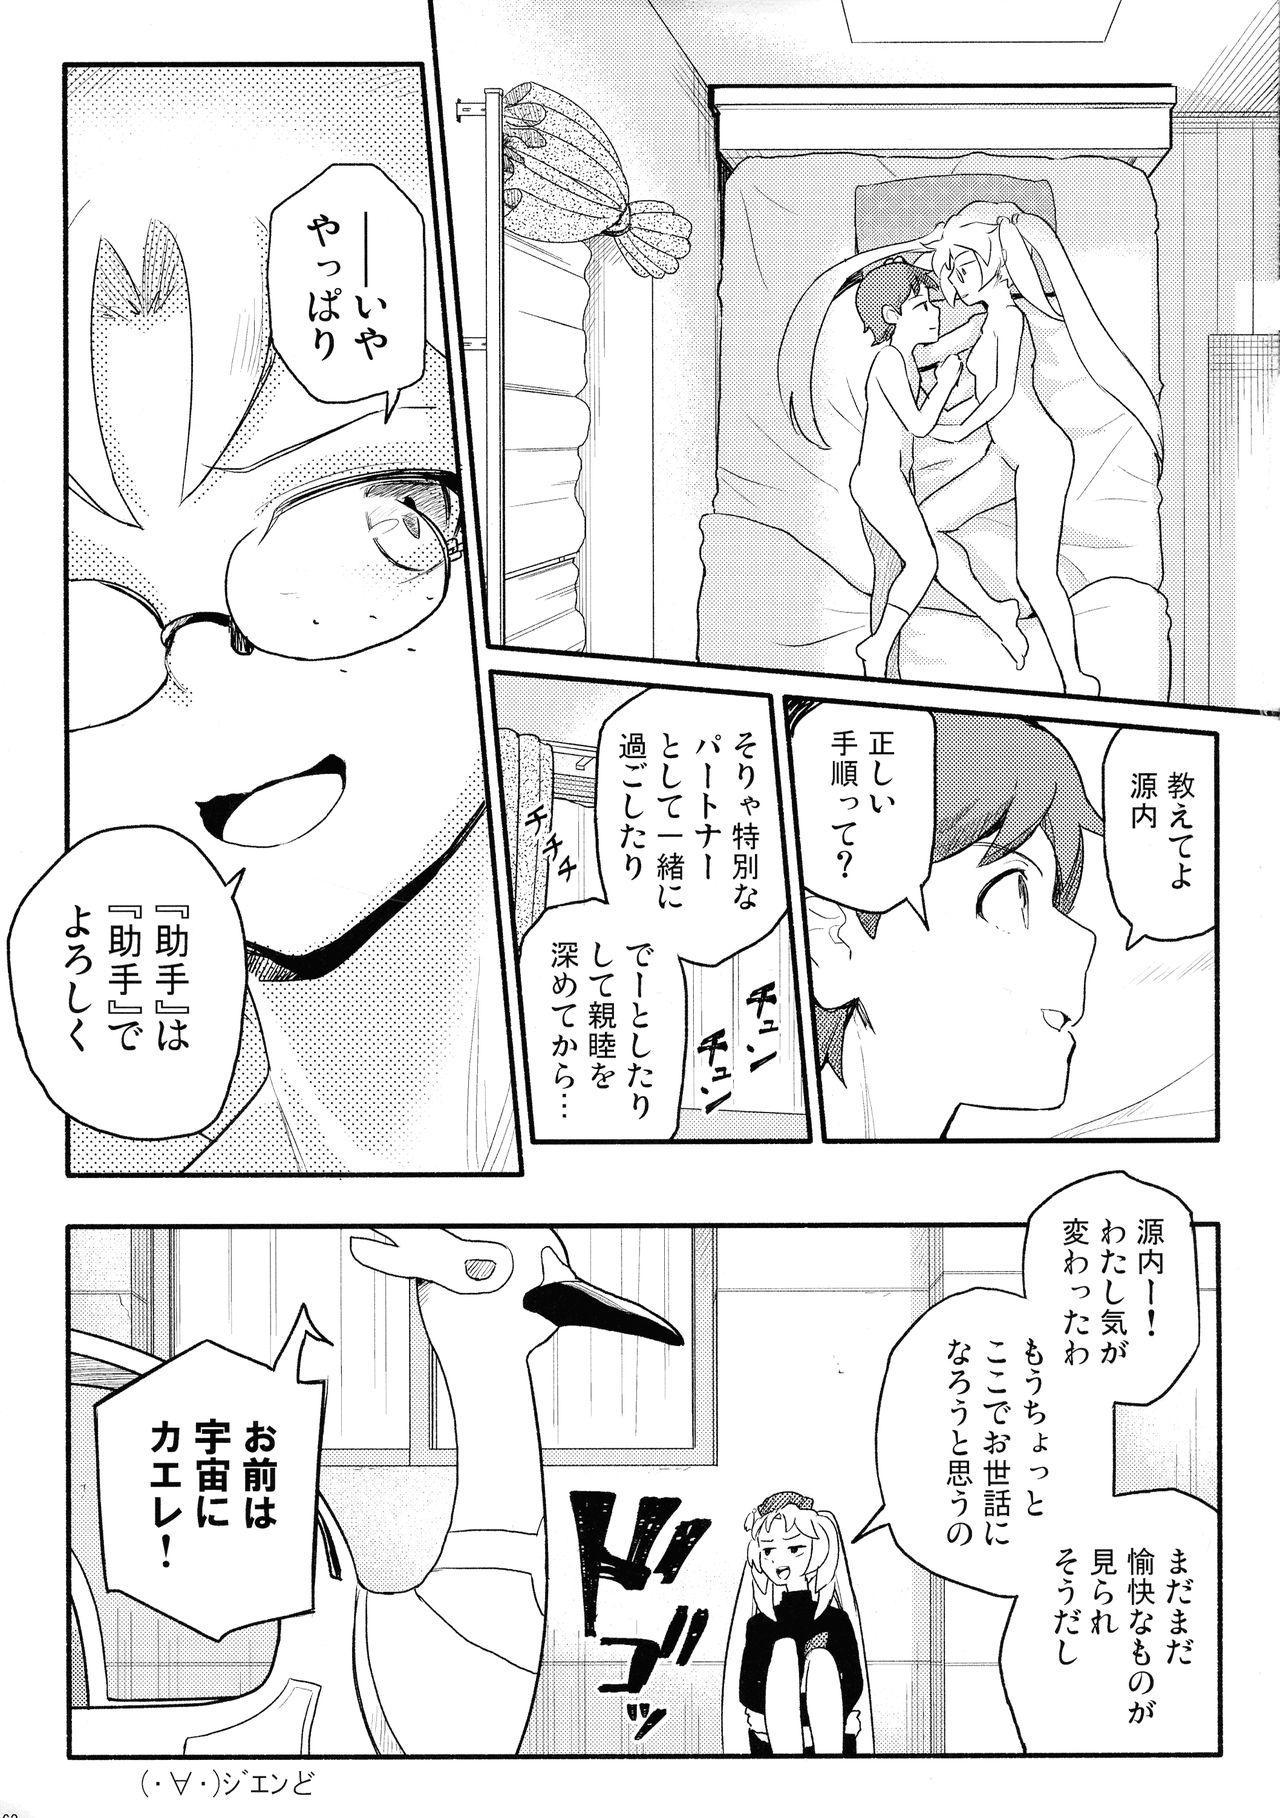 Muhou!! Hiraga Gennai-chan Ecchi Goudoushi 62